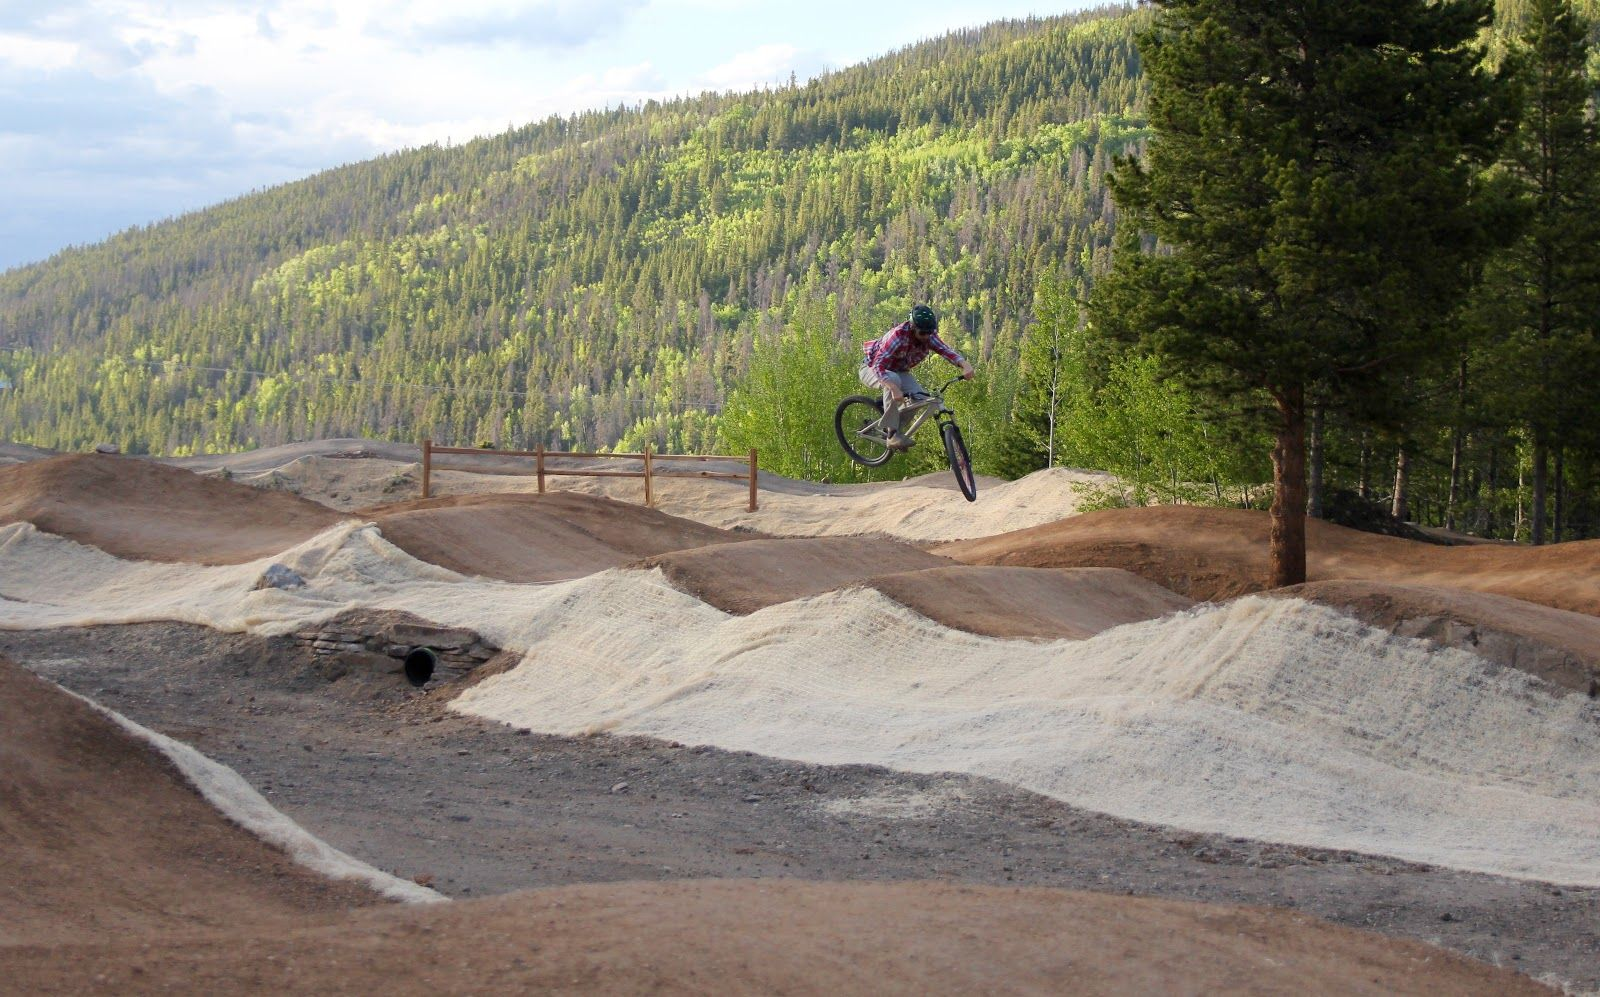 Bike Park Design | Elevated Trail Design